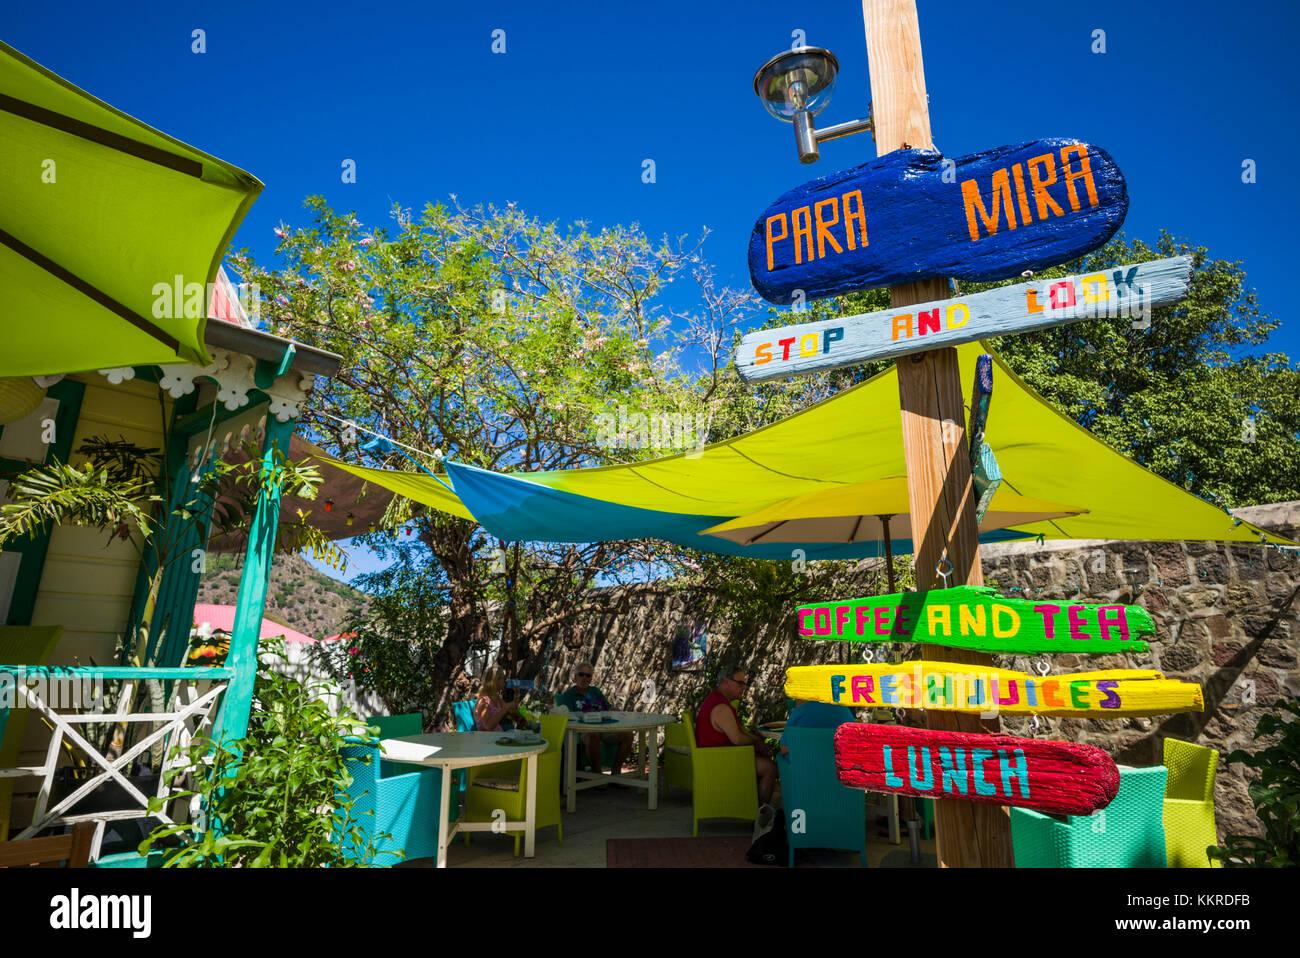 Pays-bas, Saint Eustache, Oranjestad, papa mira bar à jus Photo Stock